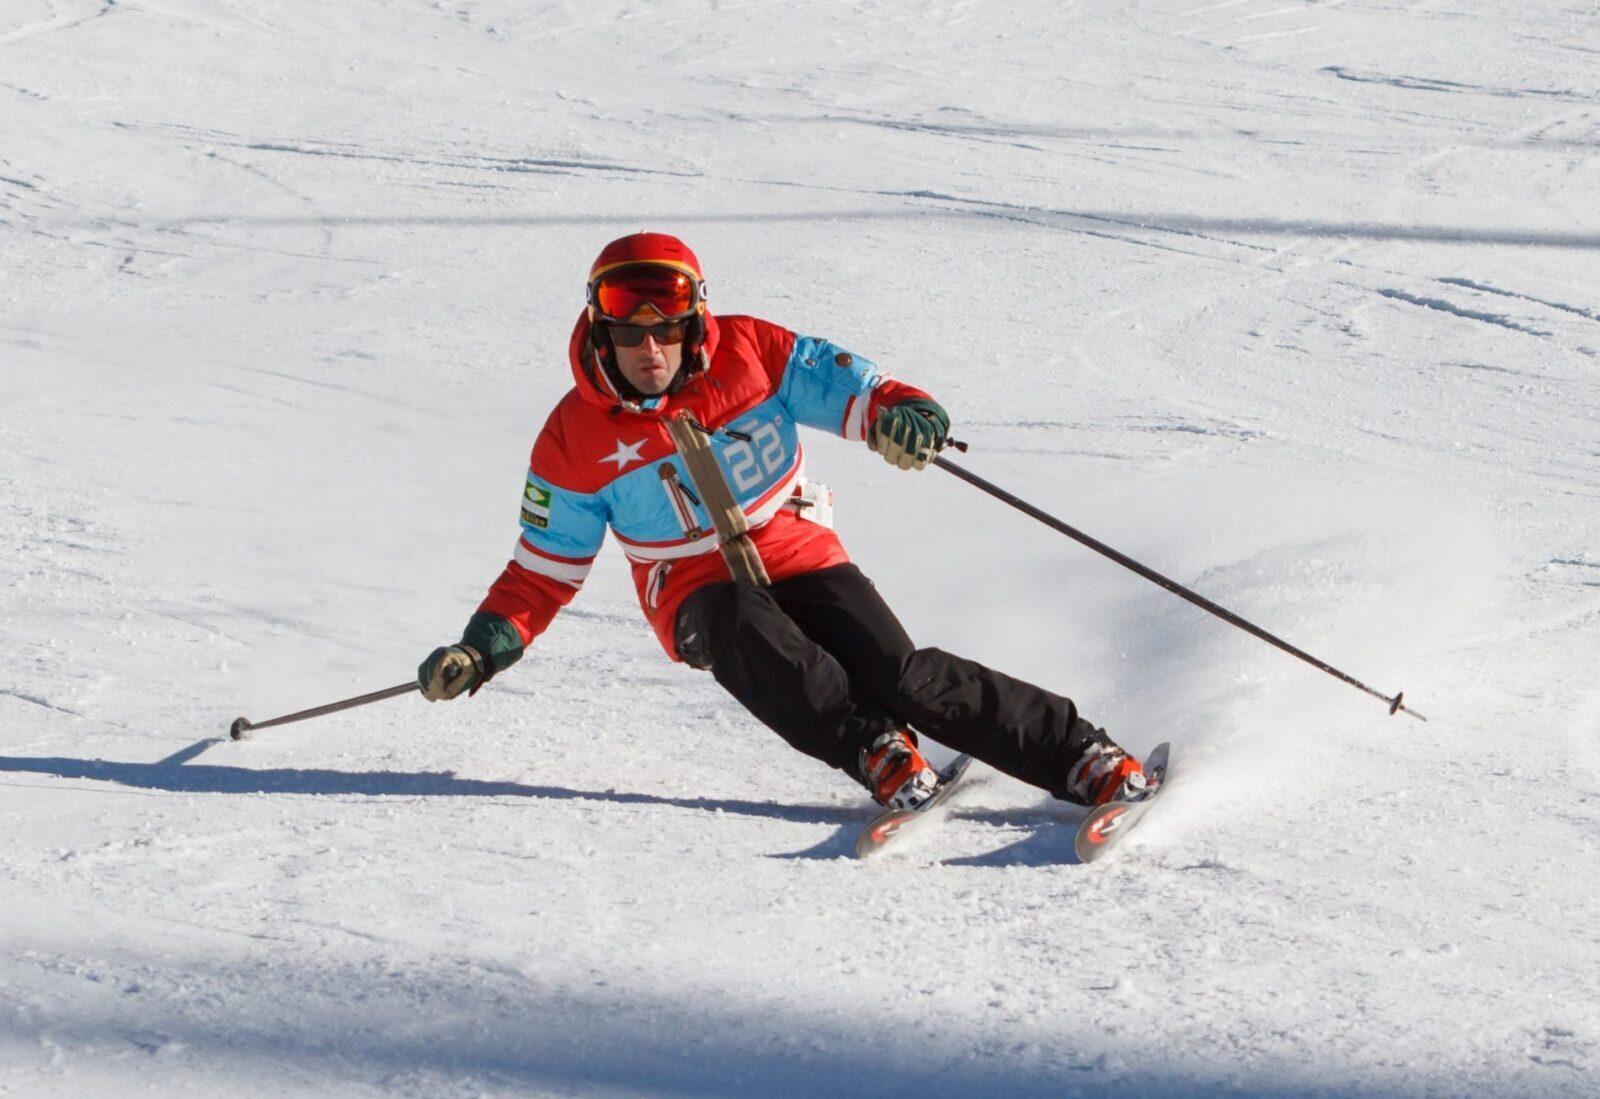 Pruebas de acceso esquí o snowboard - race 2